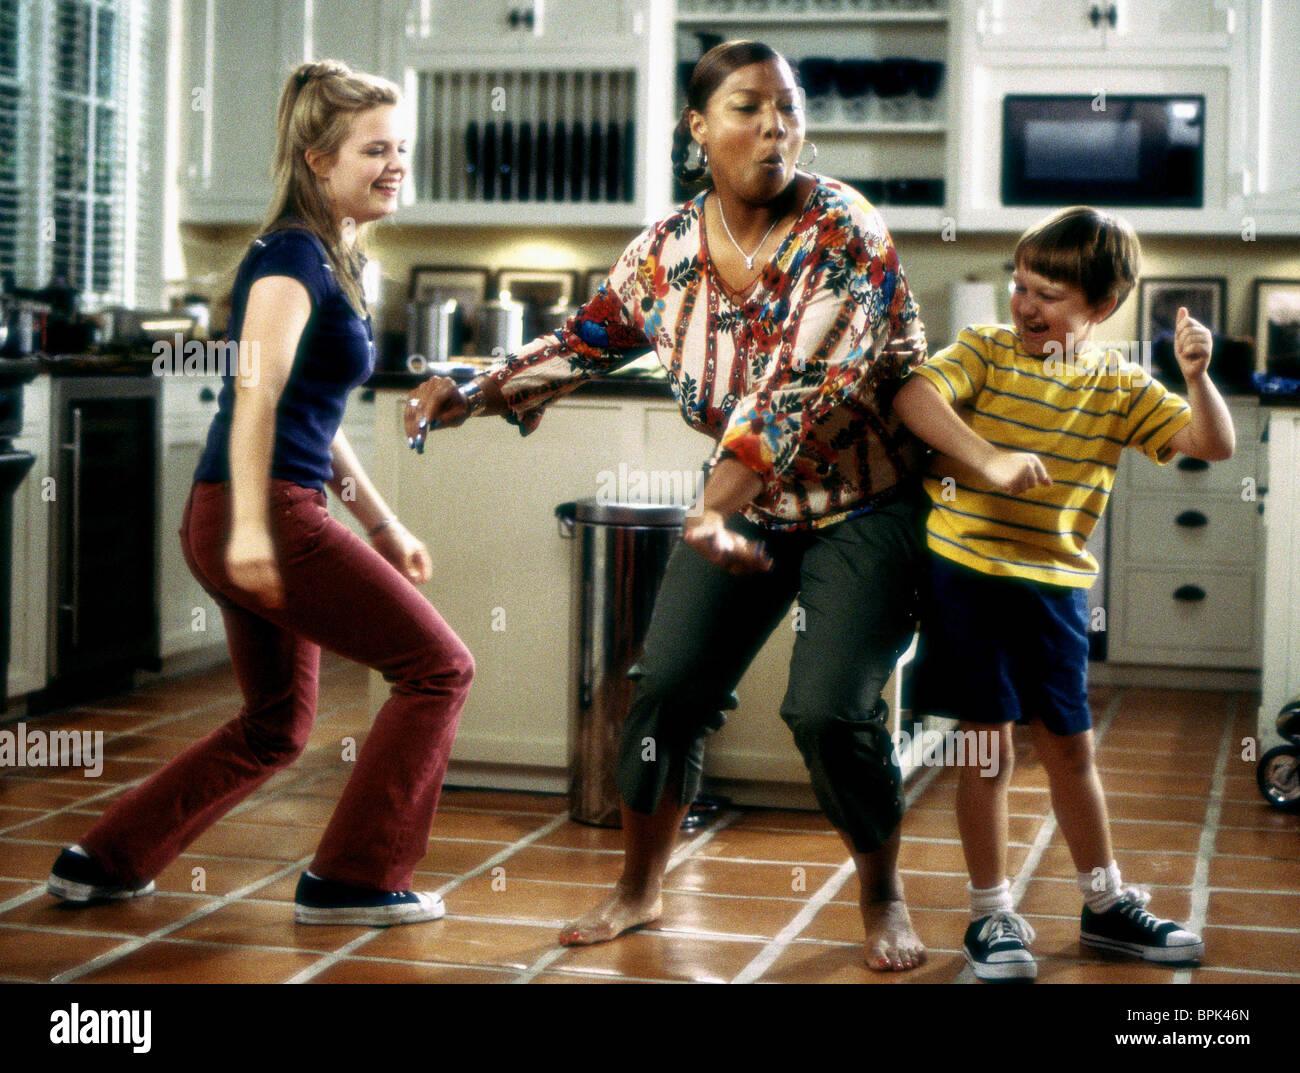 KIMBERLY BROWN QUEEN LATIFAH U0026 ANGUS T JONES BRINGING DOWN THE HOUSE (2003)